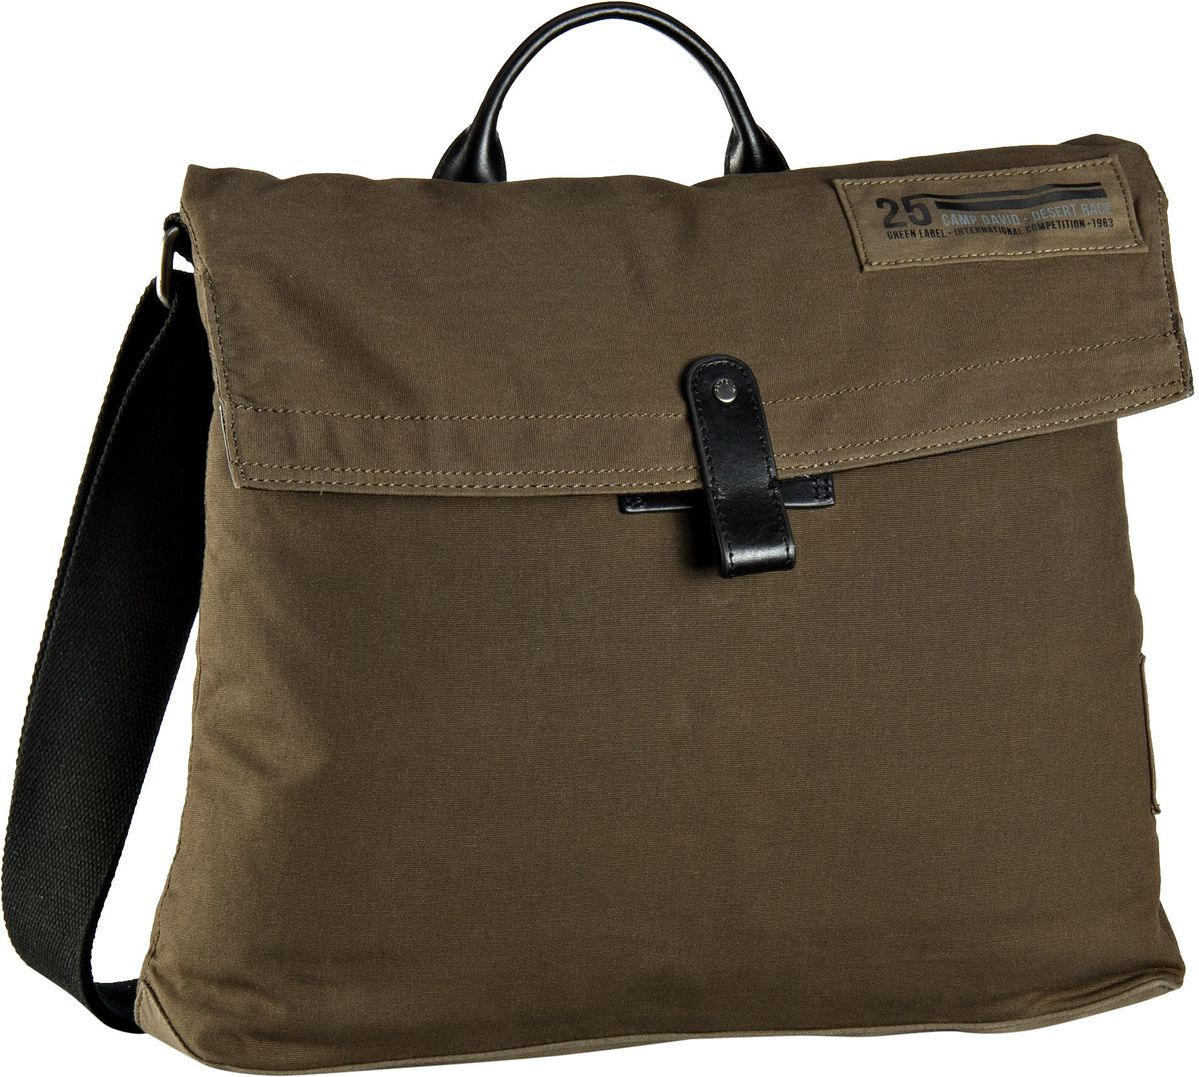 Camp David Mount Logan 40007 Umhängetasche Khaki - Notebooktasche / Tablet